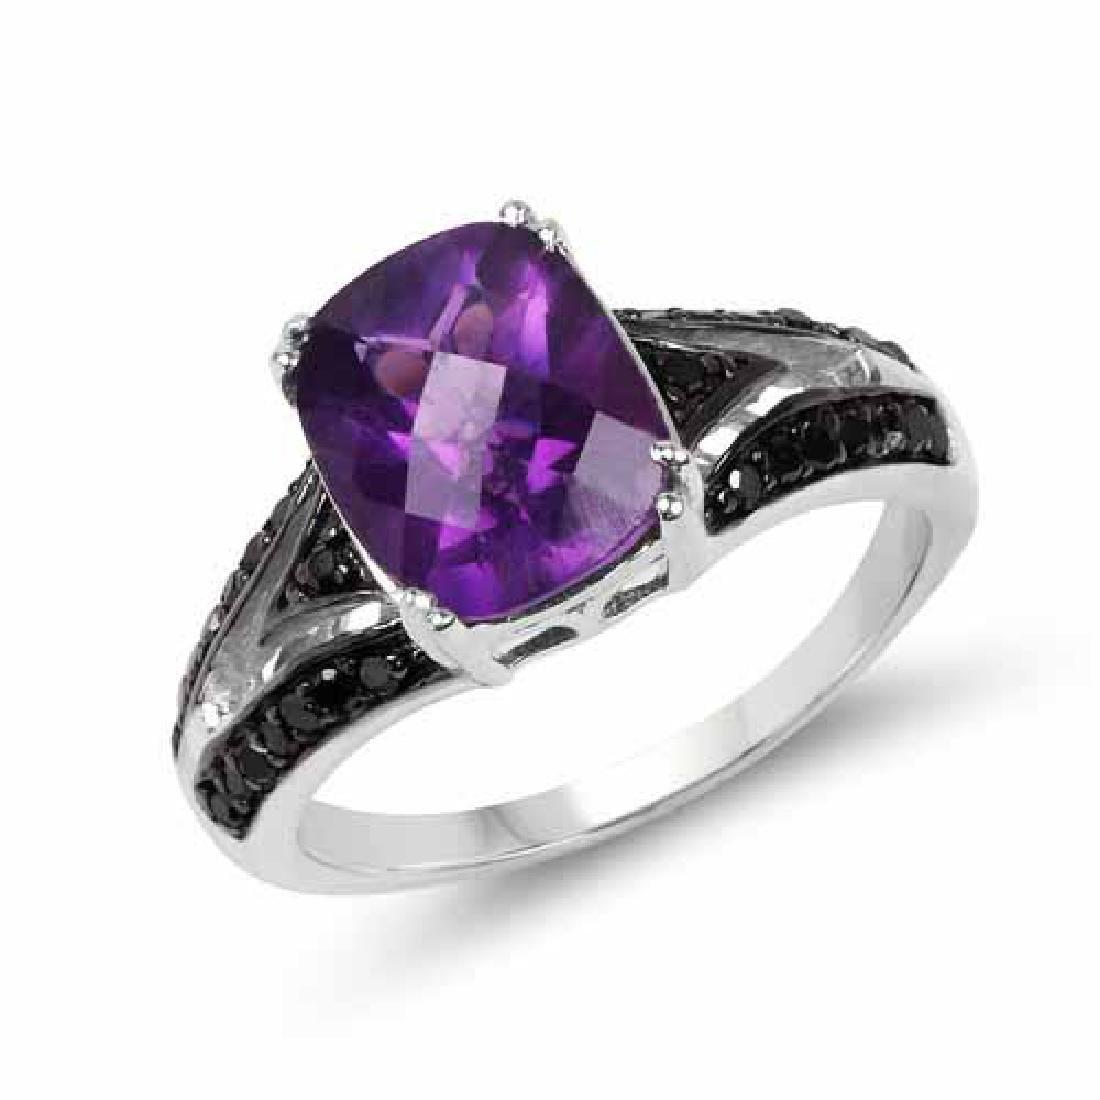 2.87 Carat Genuine Amethyst Black Diamond and White Di